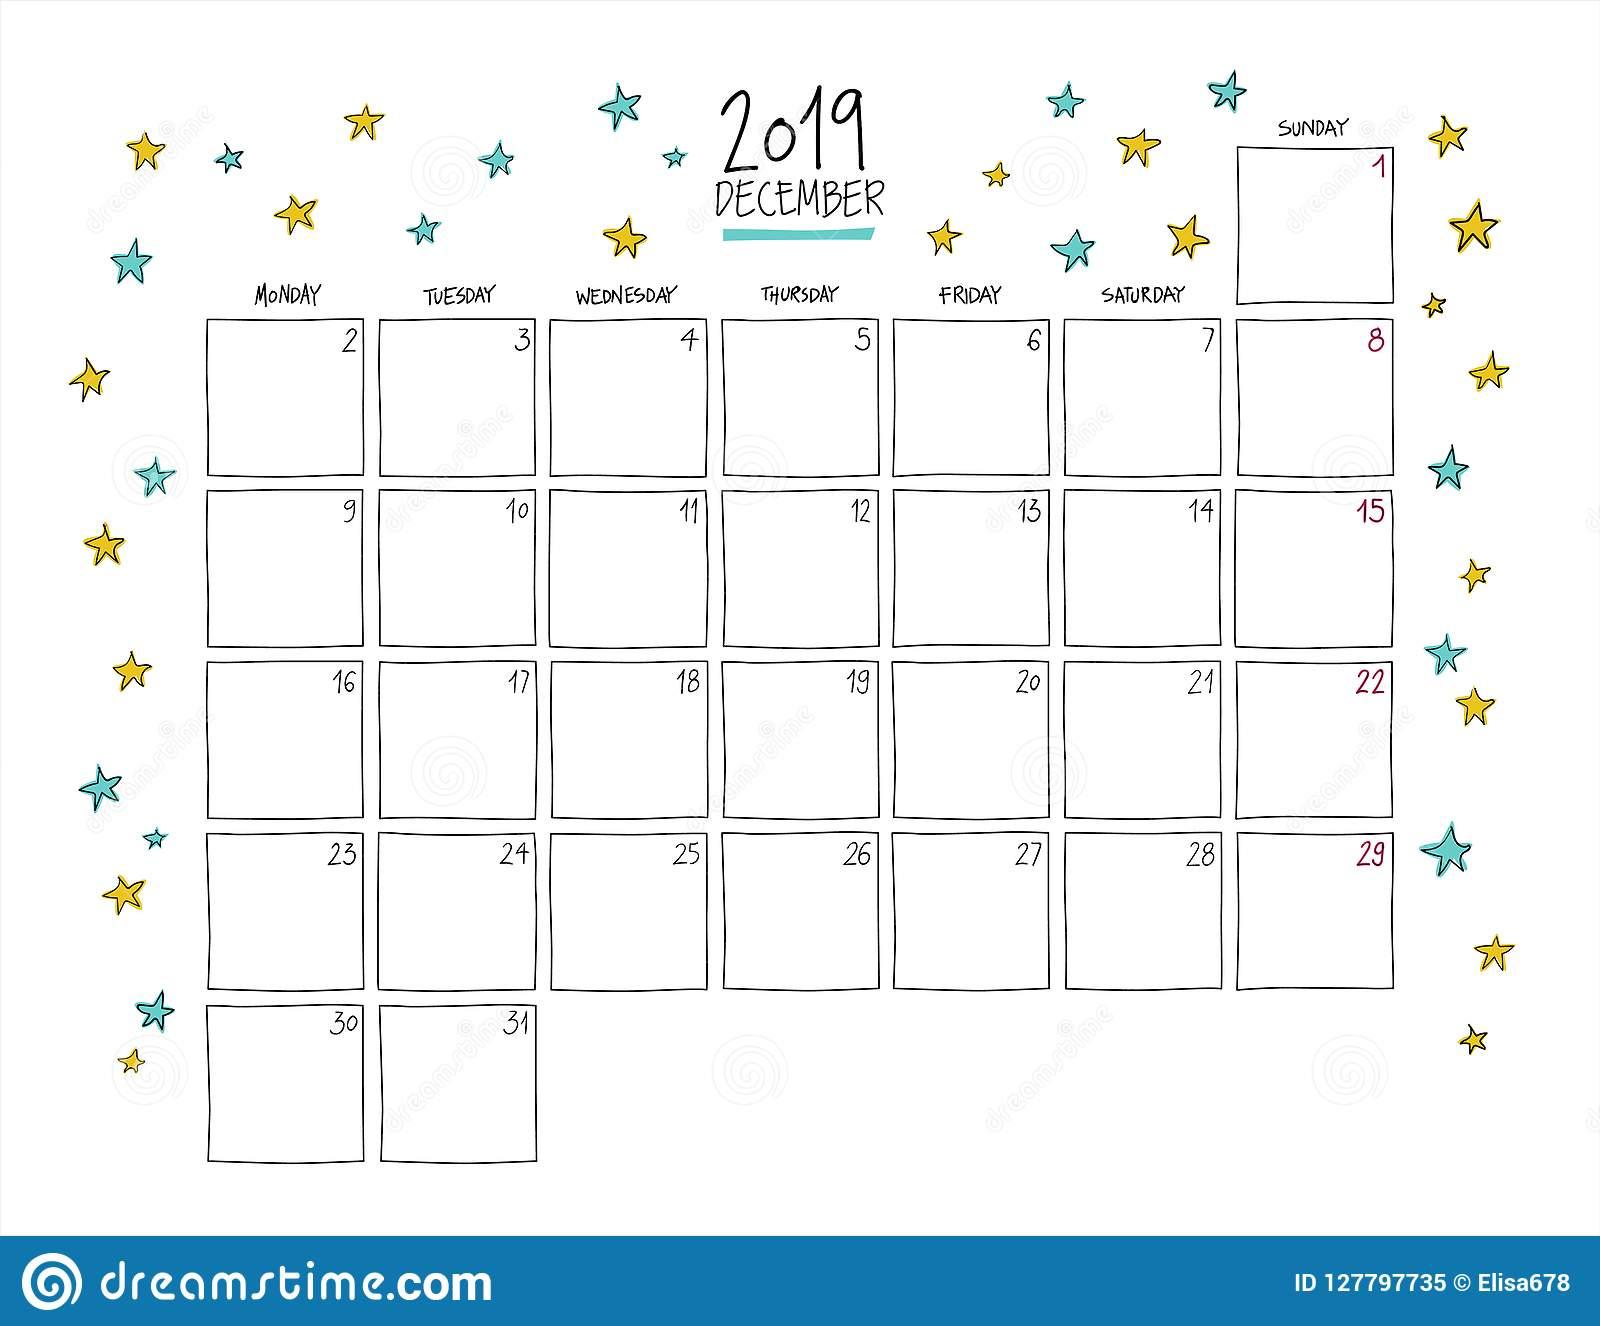 December 2019 Wall Calendar. Doodle Style. Stock Vector